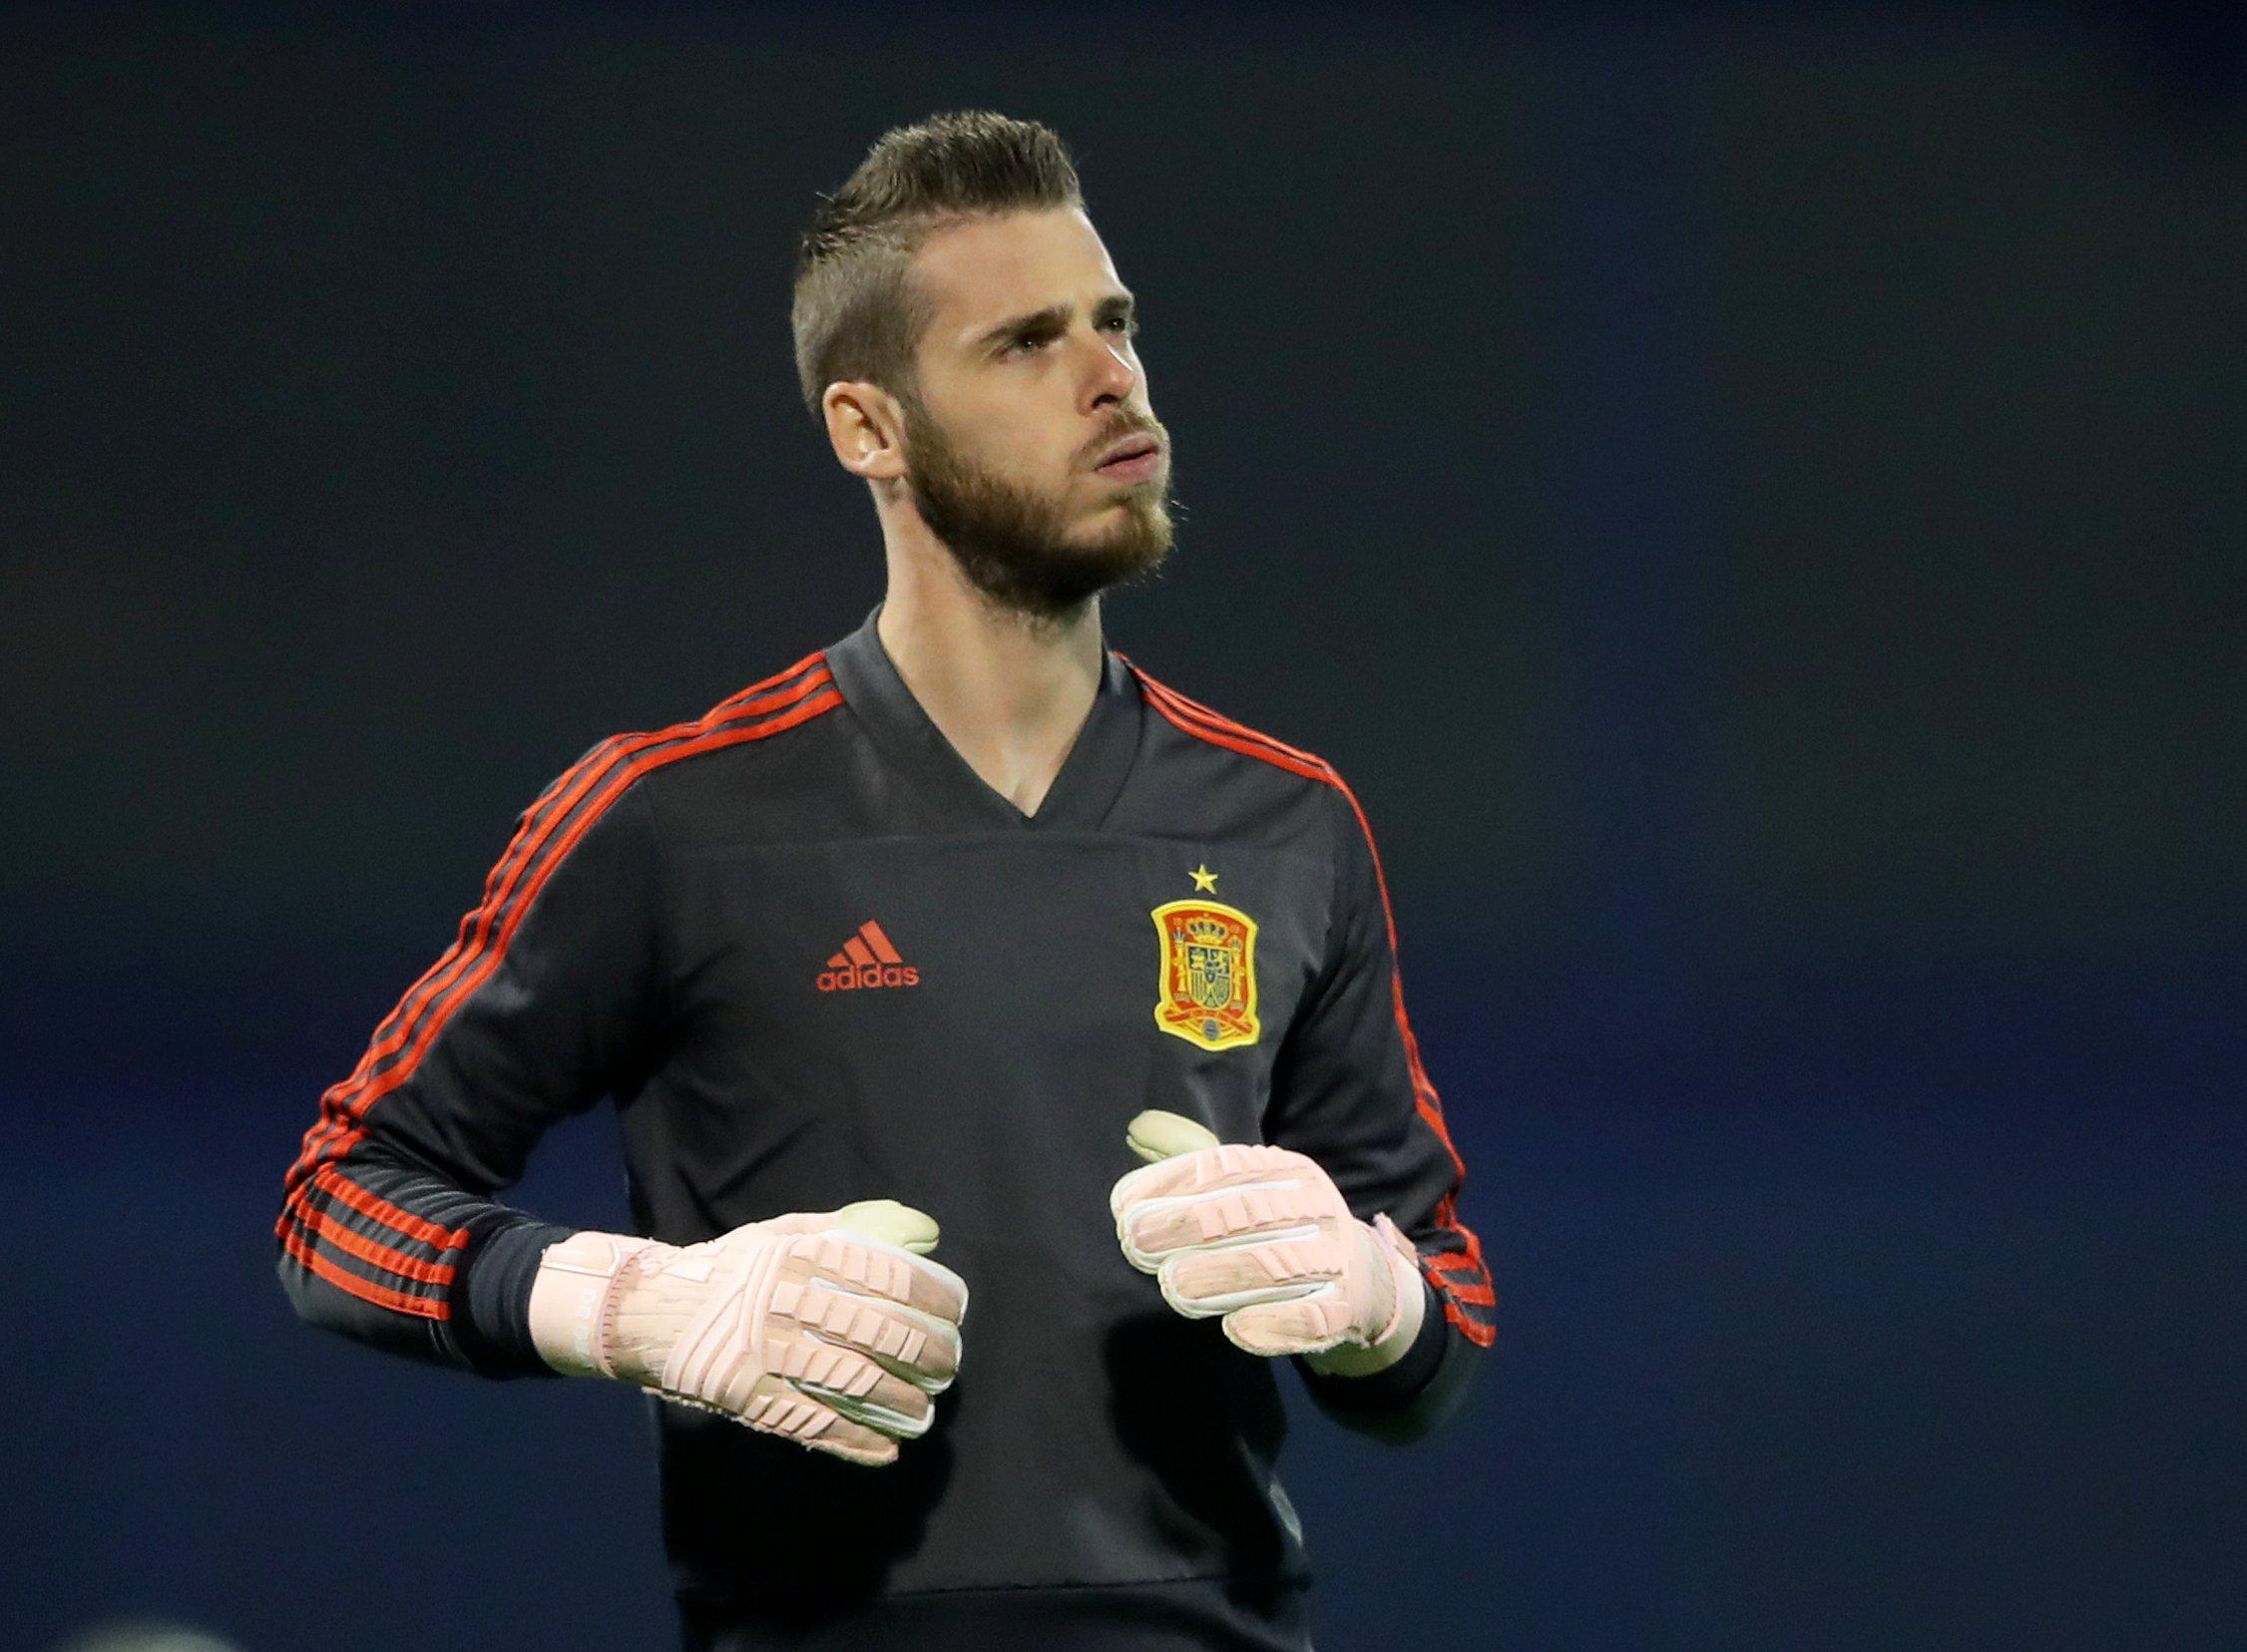 Spain boss Luis Enrique to drop David de Gea after latest blunder and hand Kepa No.1 shirt